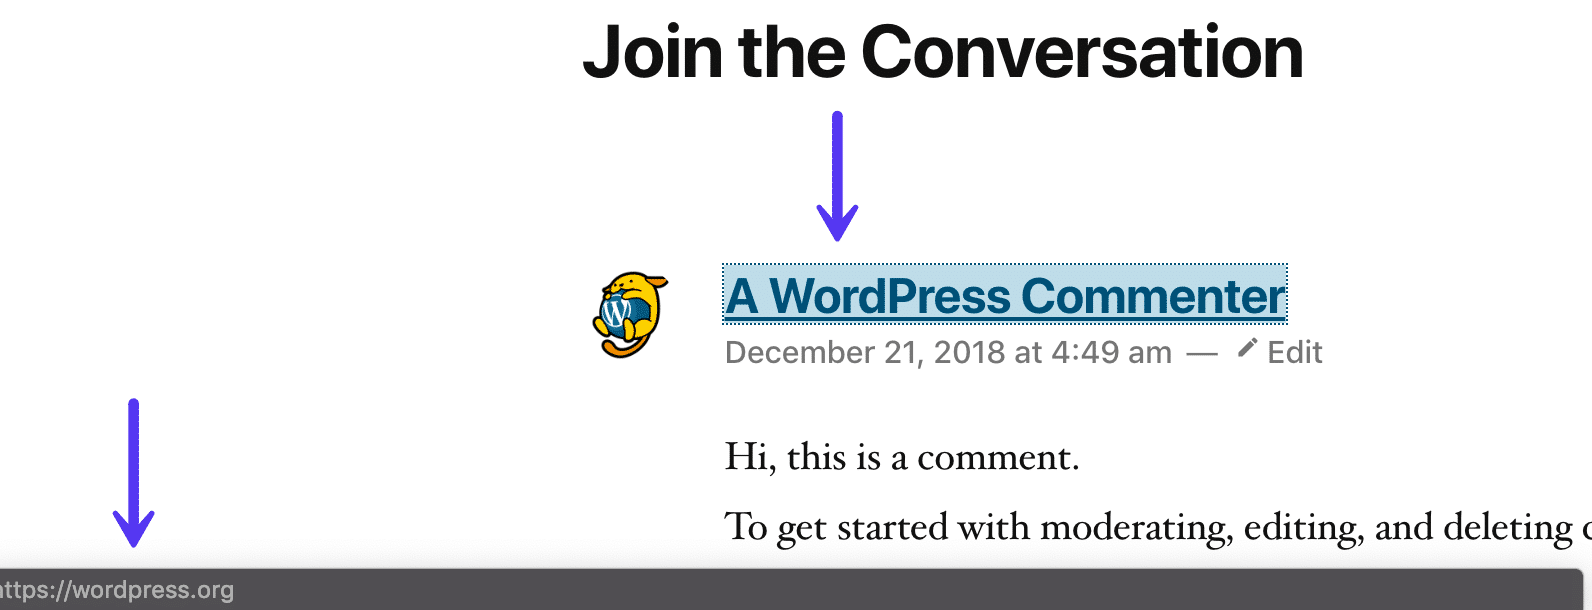 WordPressのコメント作者のリンク